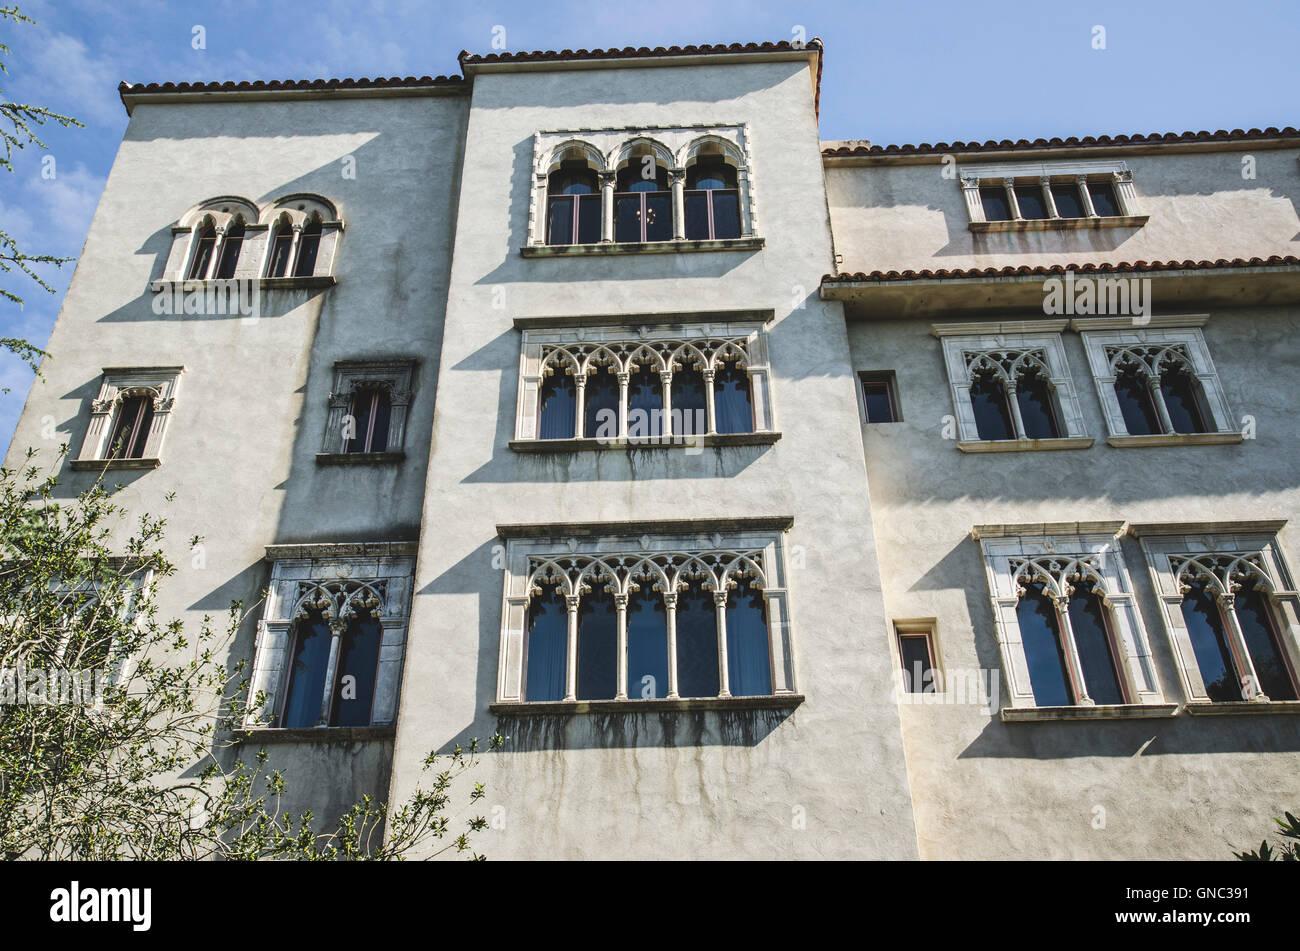 Heart Castle Detail, San Simeon, California, USA - Stock Image